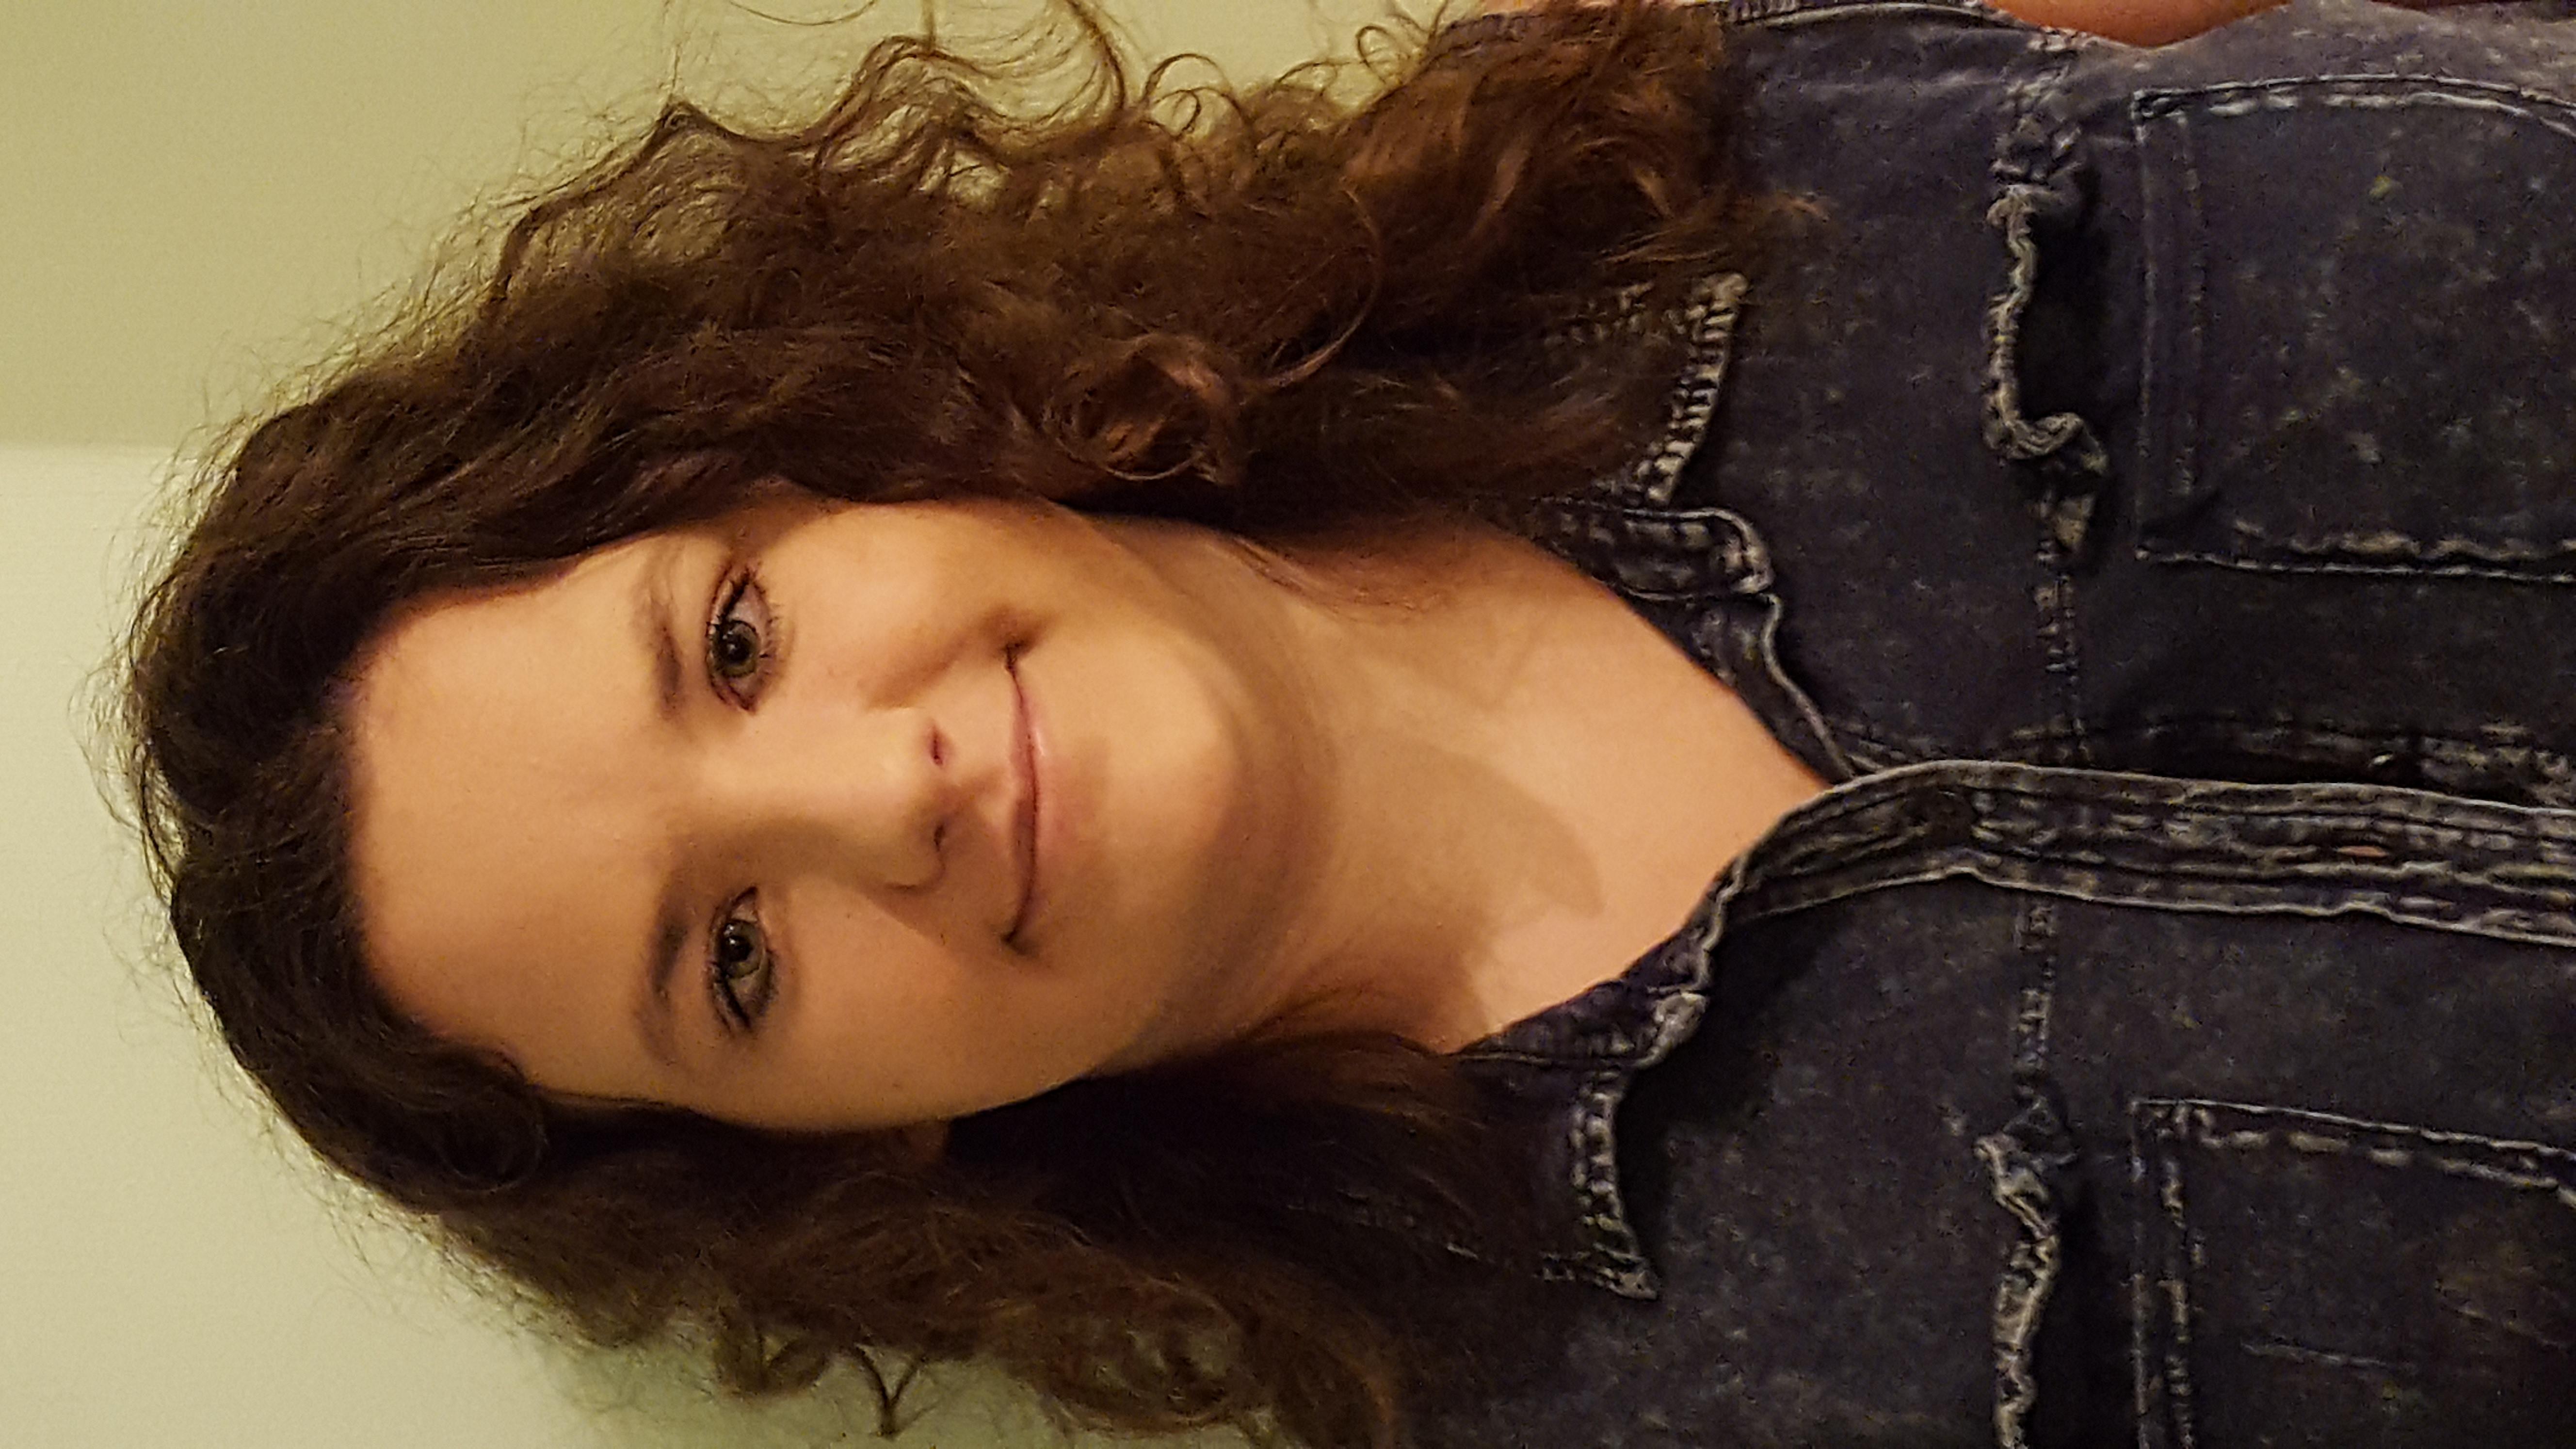 imani heidel Looking for Merchandiser Jobs in Nyack, NY | Sulekha